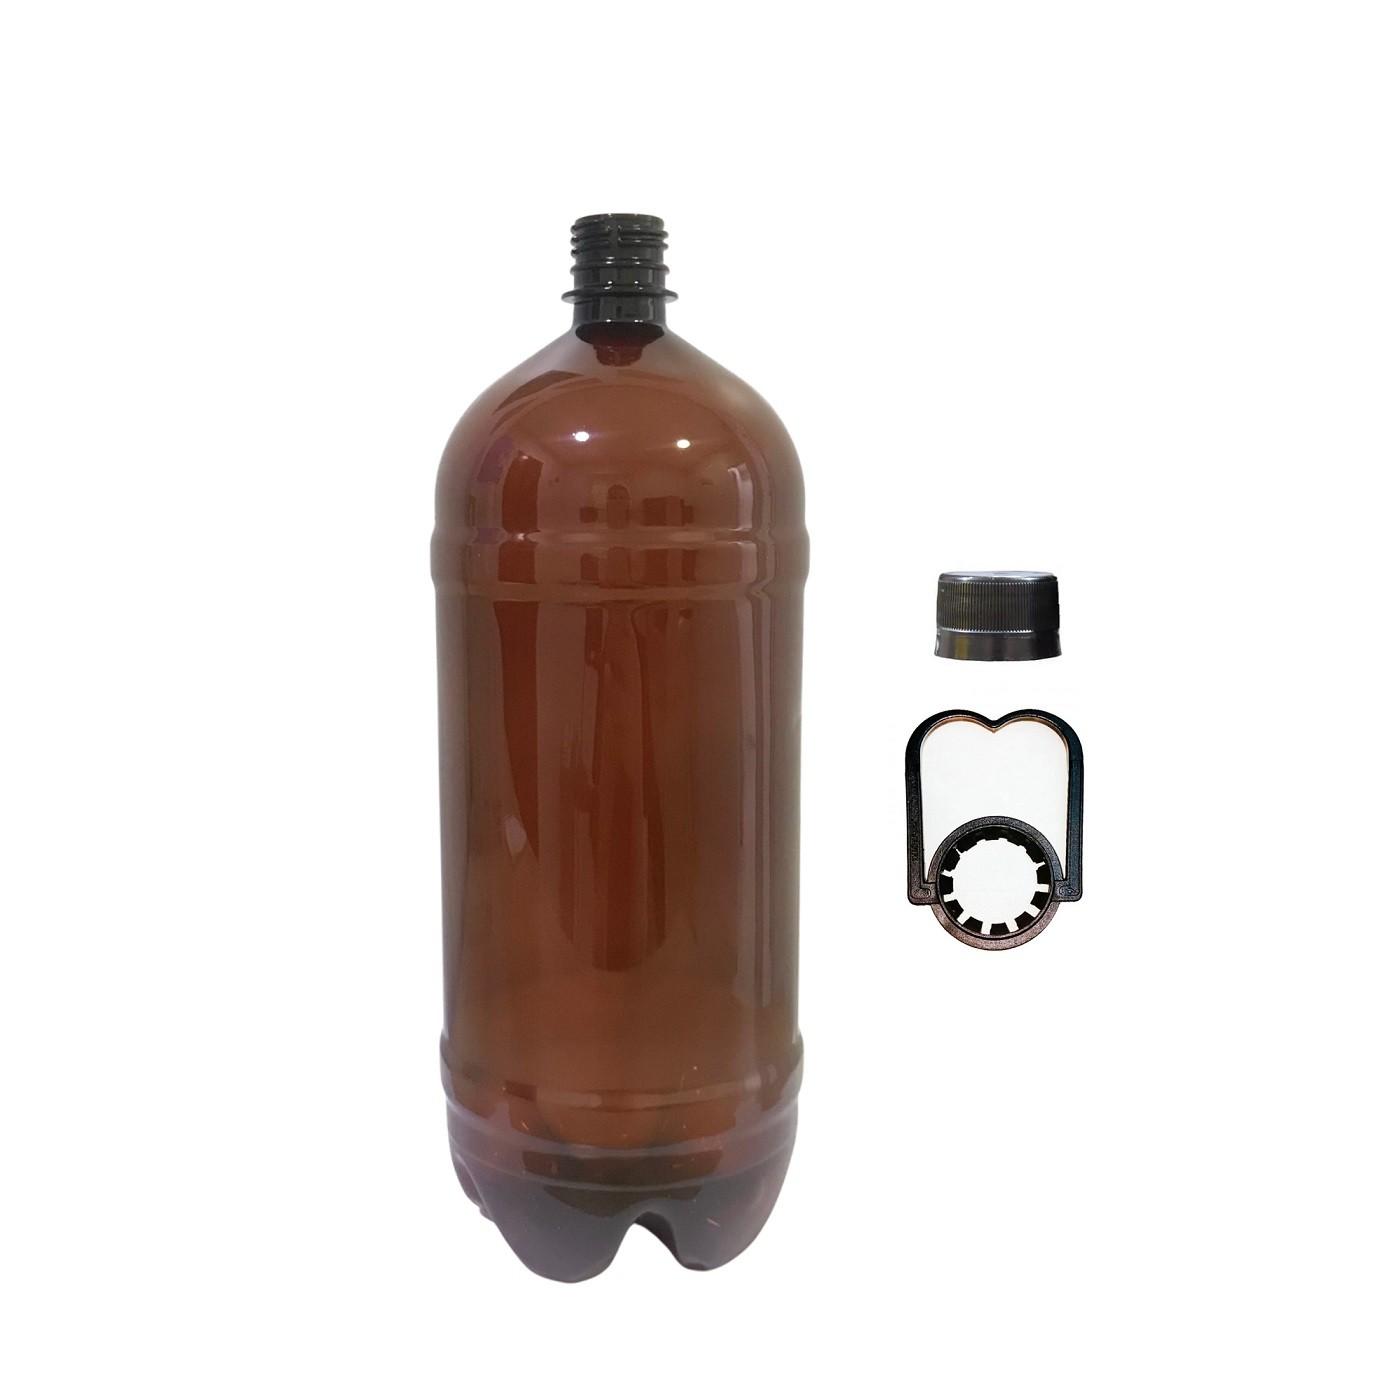 Garrafa Plástica PET 2L (Growler)